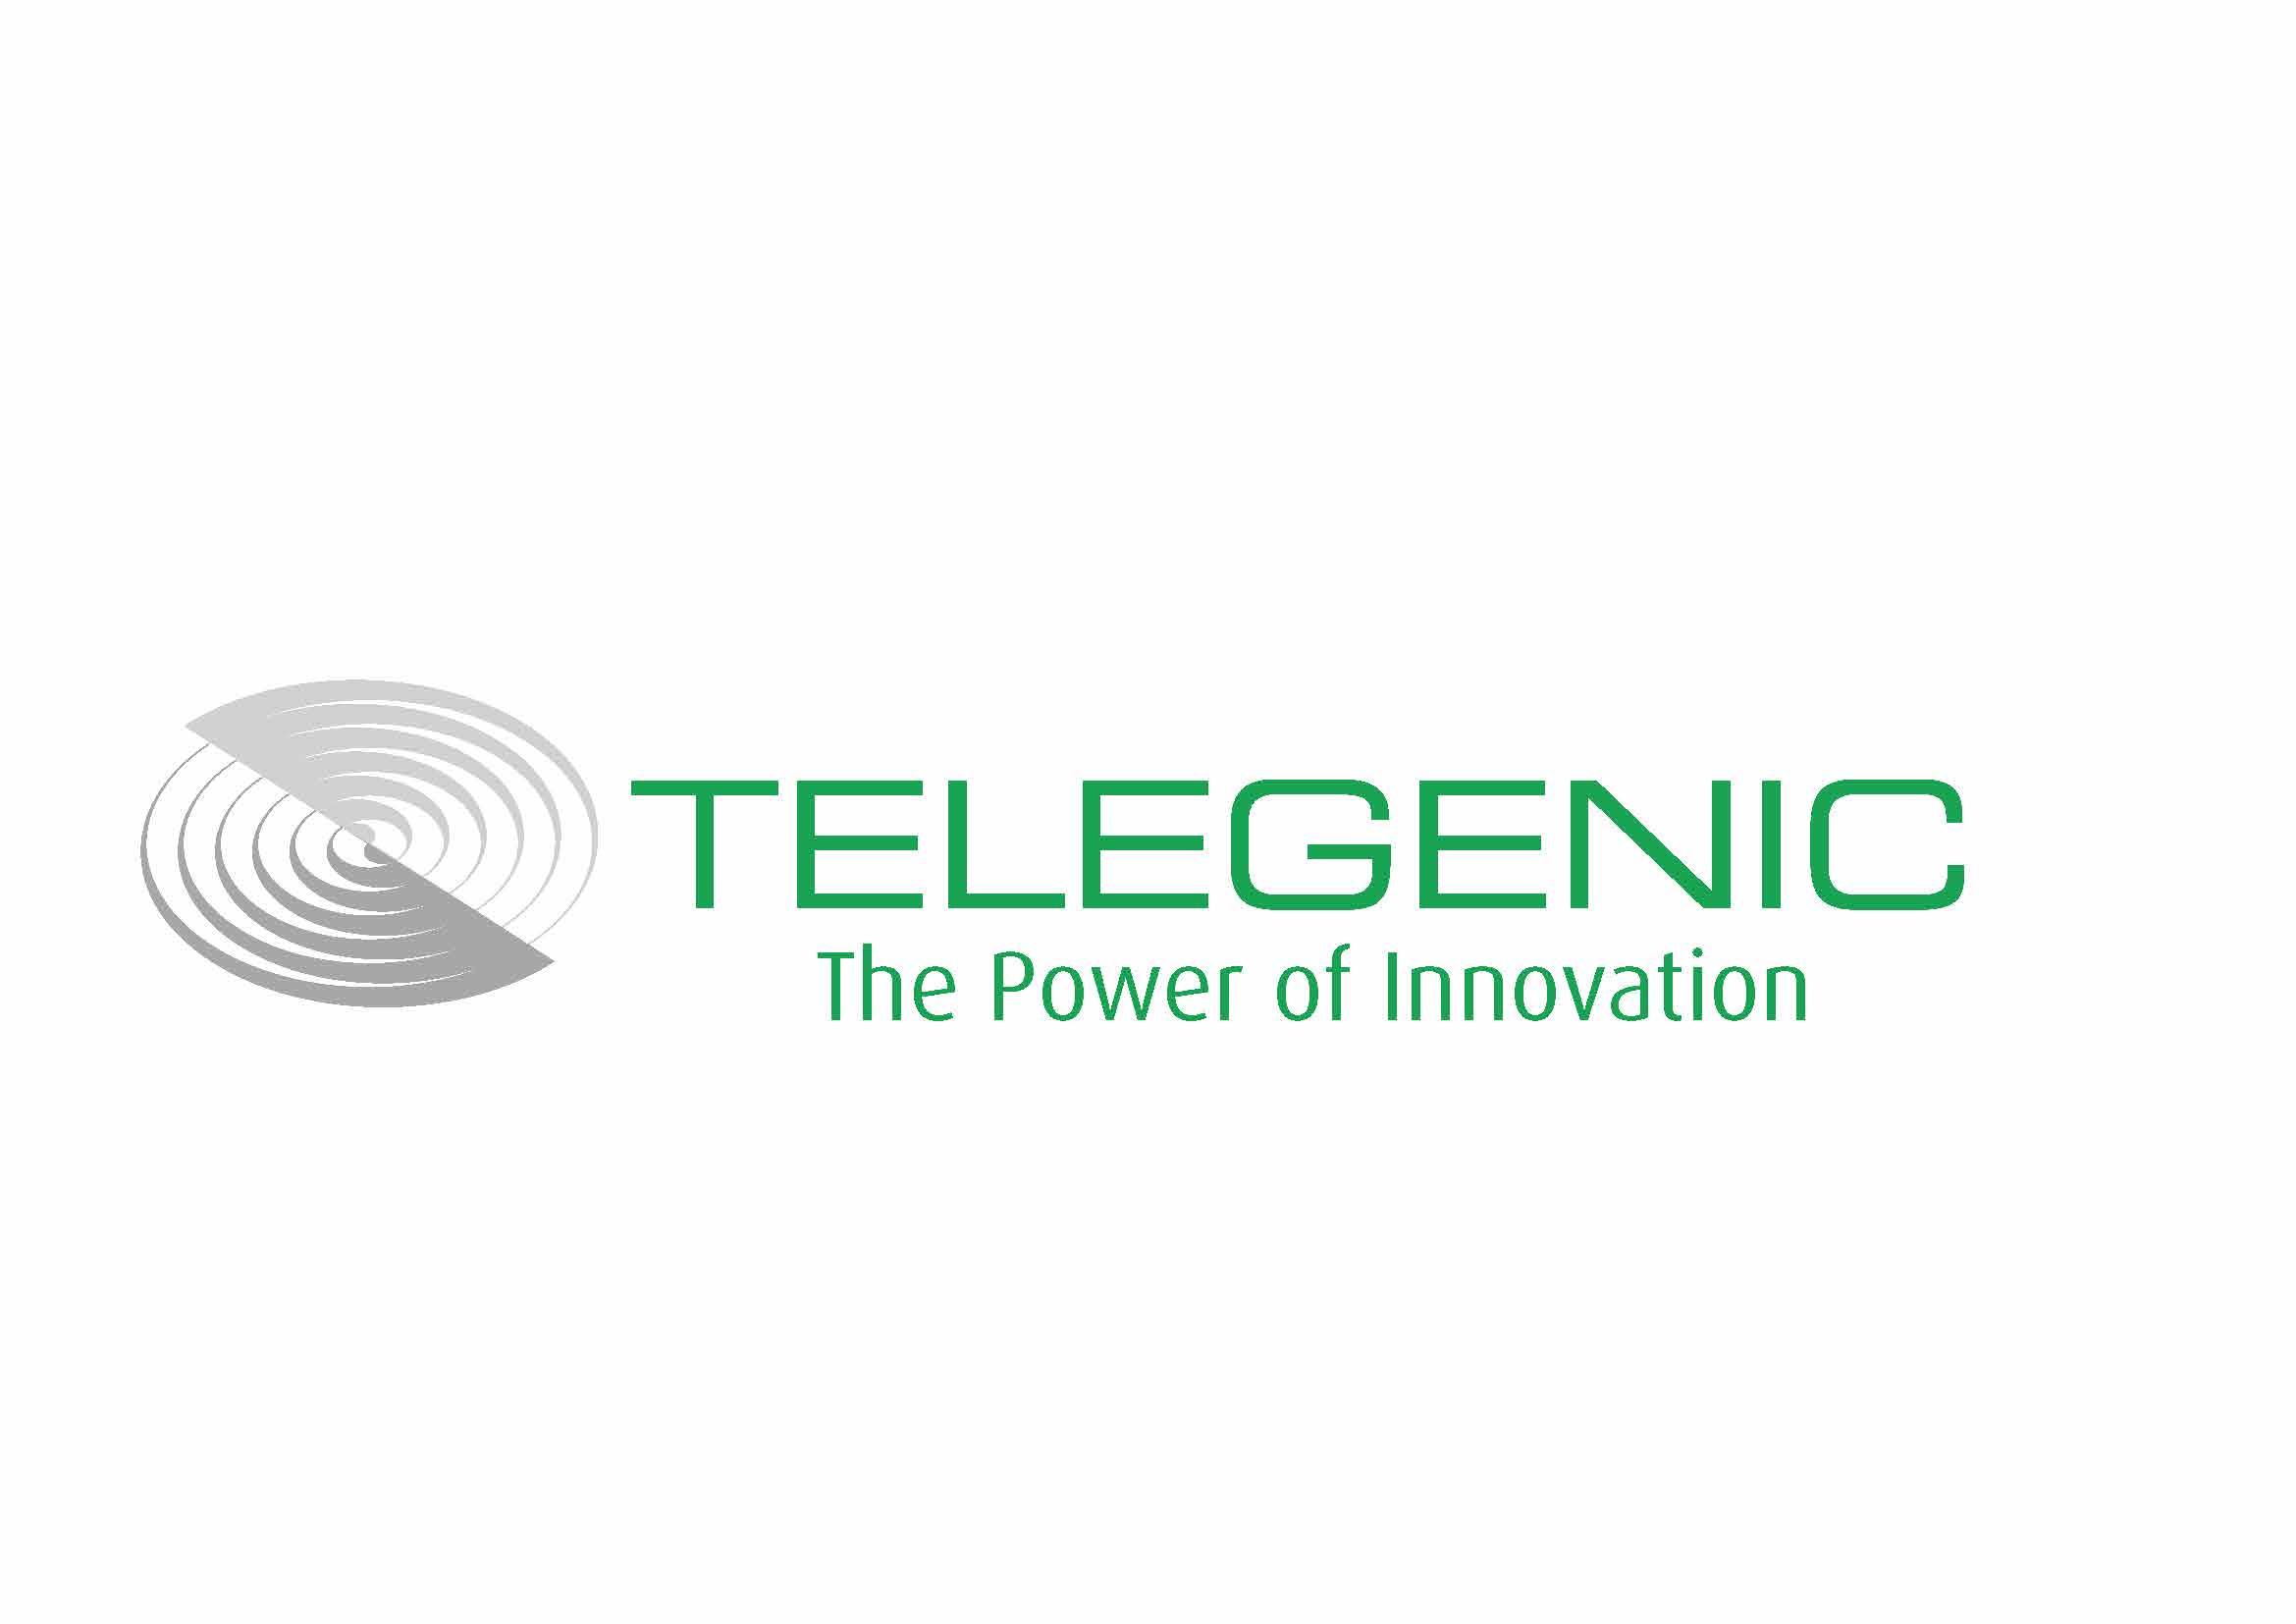 A photo of Telegenic